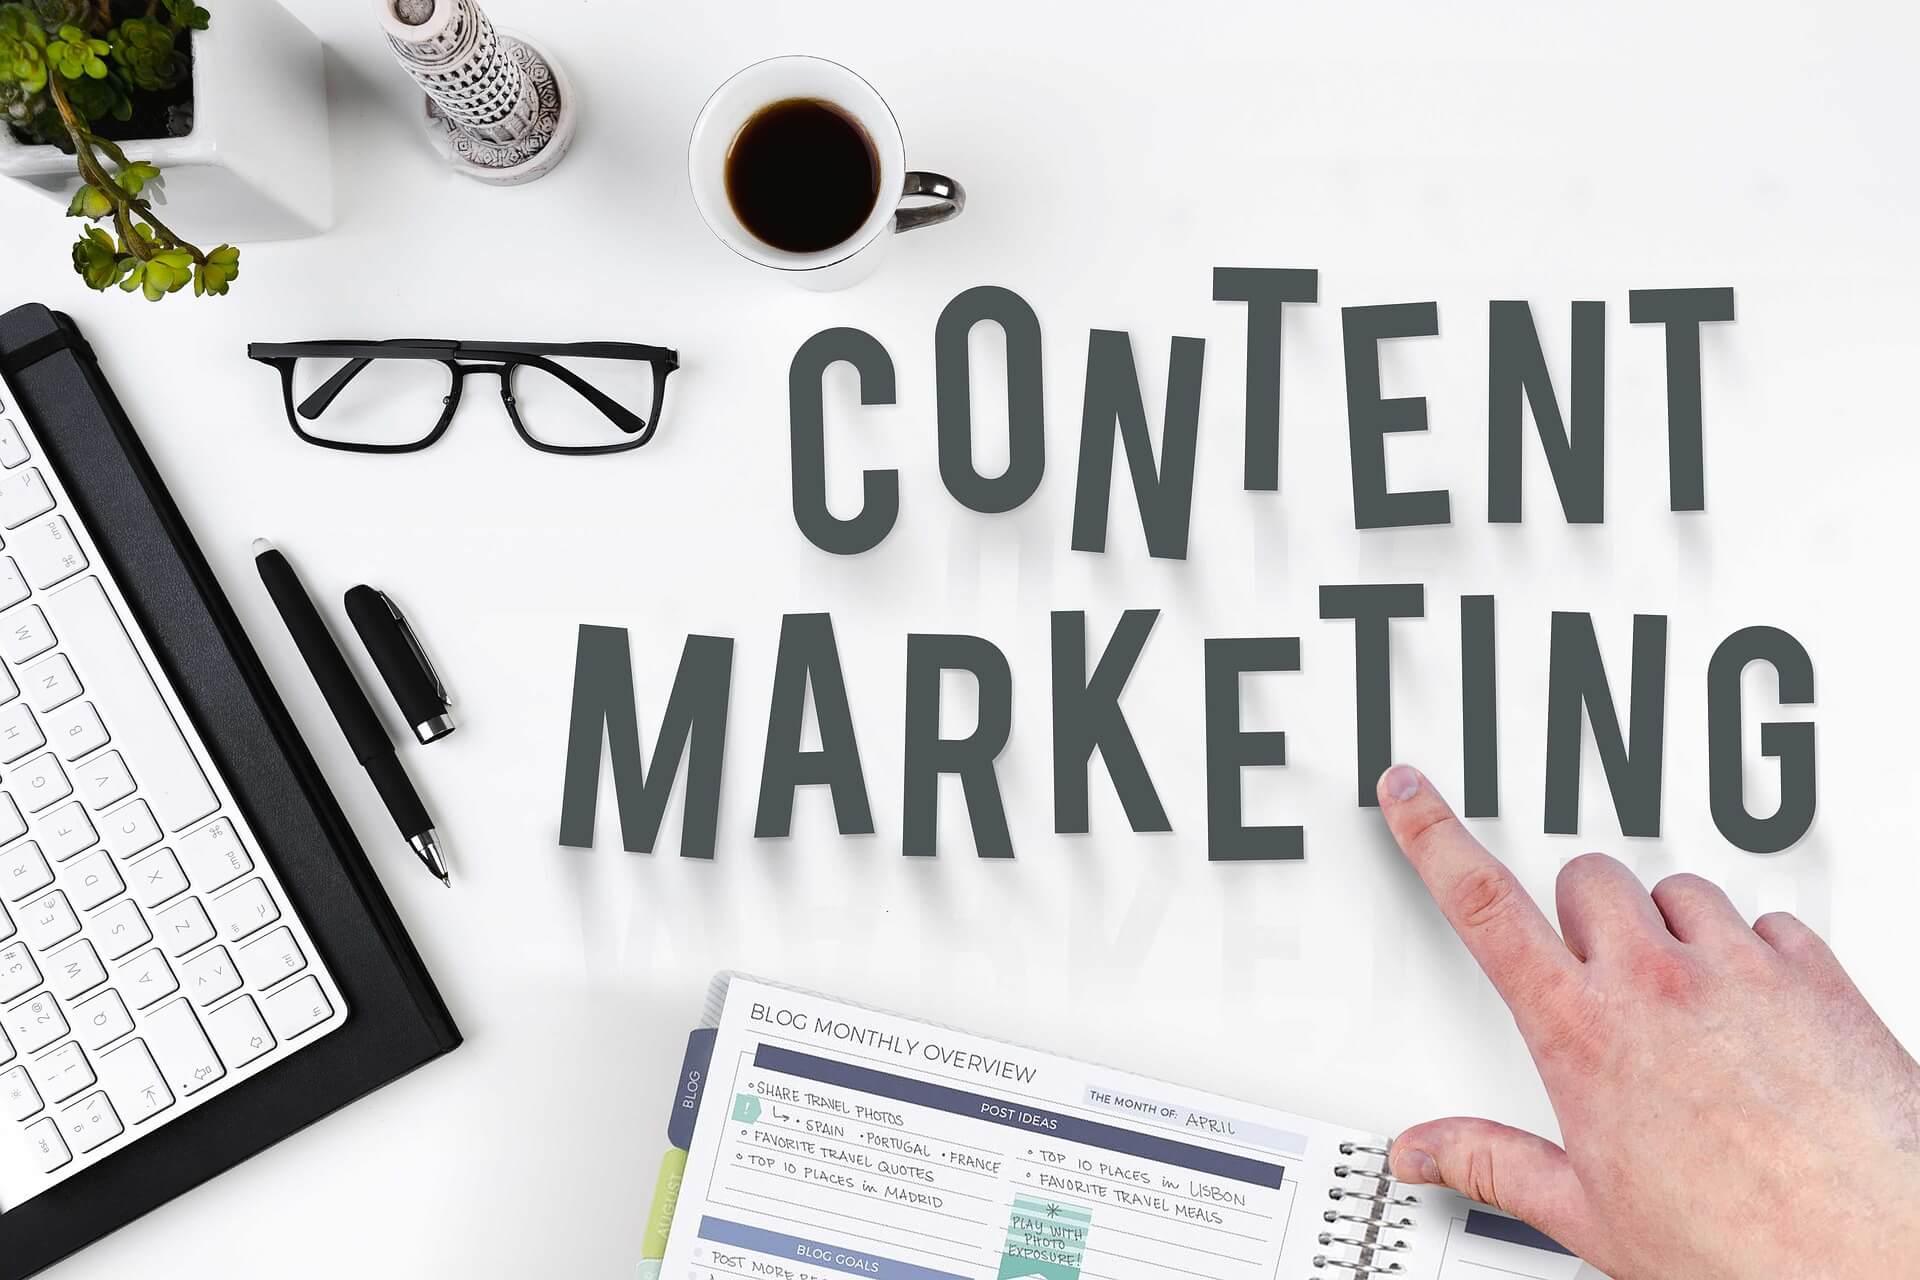 Does Content Marketing Work? - Bridge the Gap Media